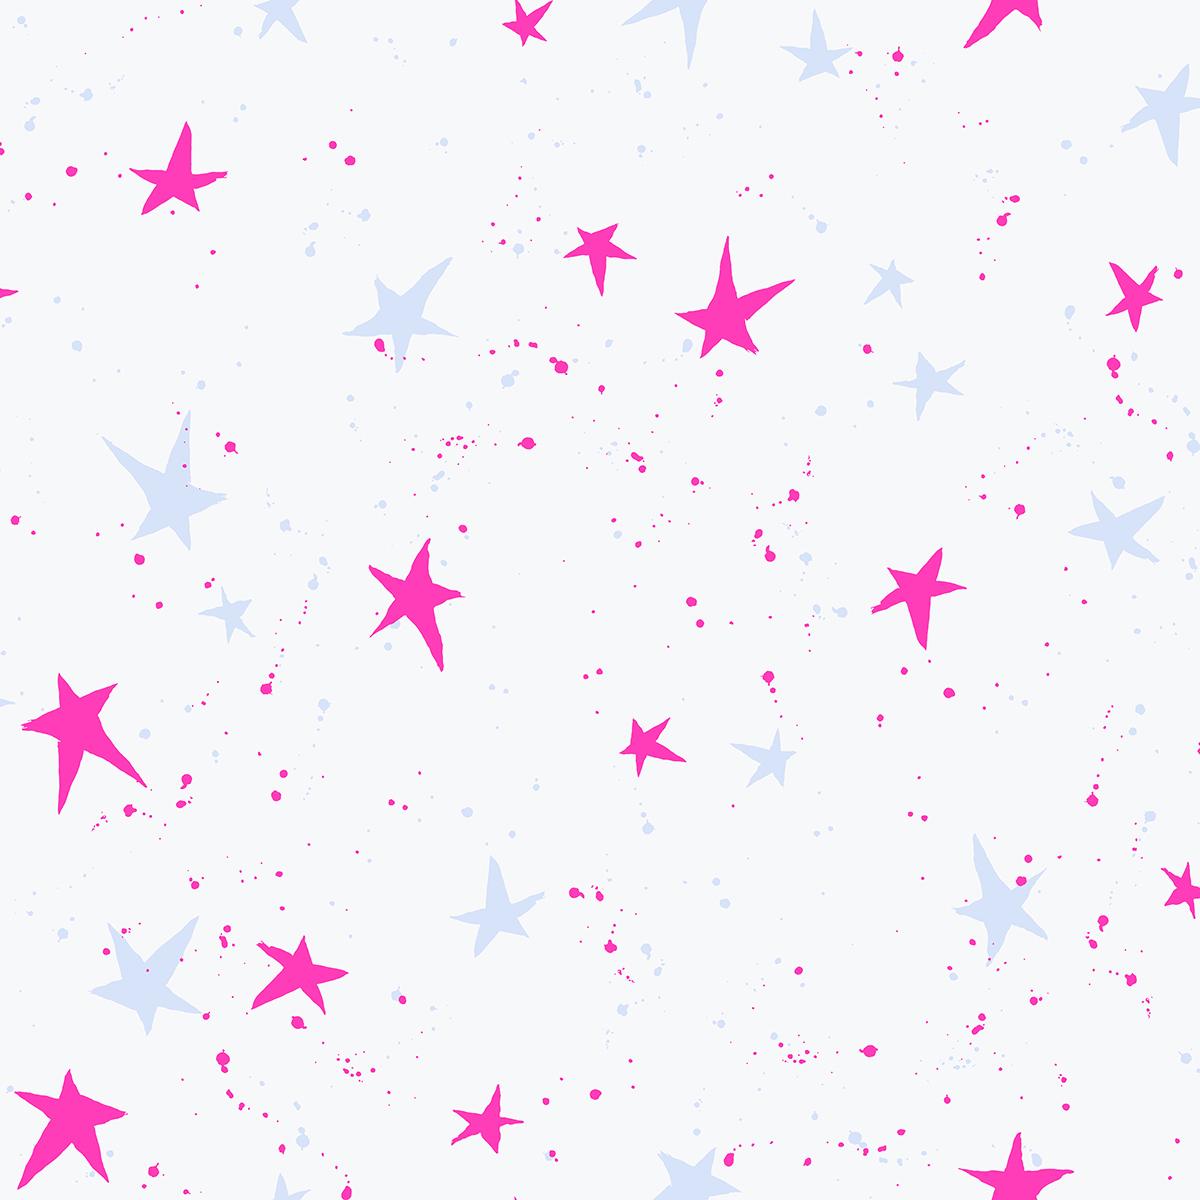 Oka Emi Snow Flowers - Kira Kira Boshi (Snow Neon)